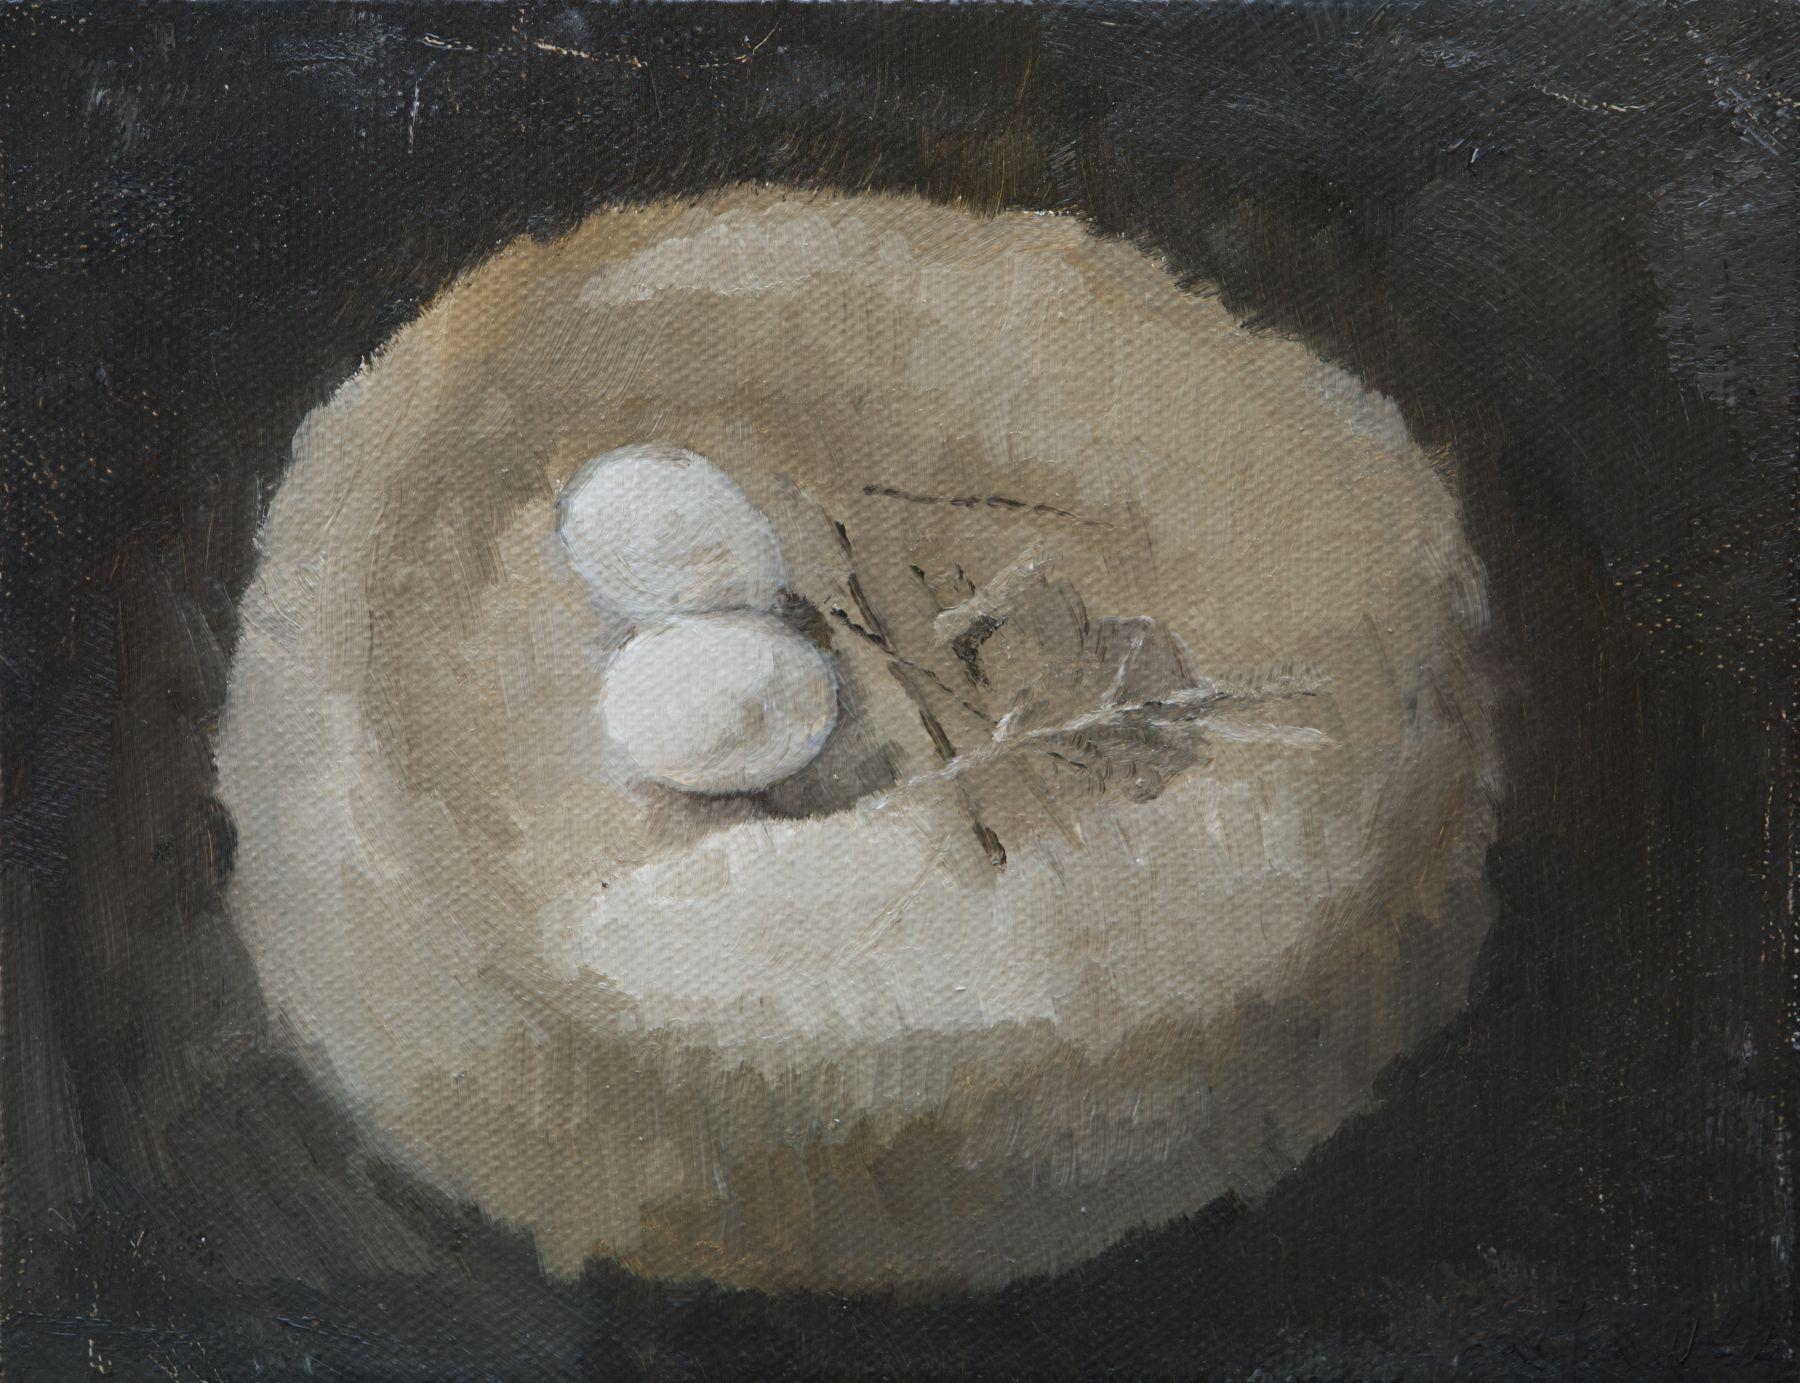 Spoiled Bird Eggåè›‹-鸟蛋, 2013